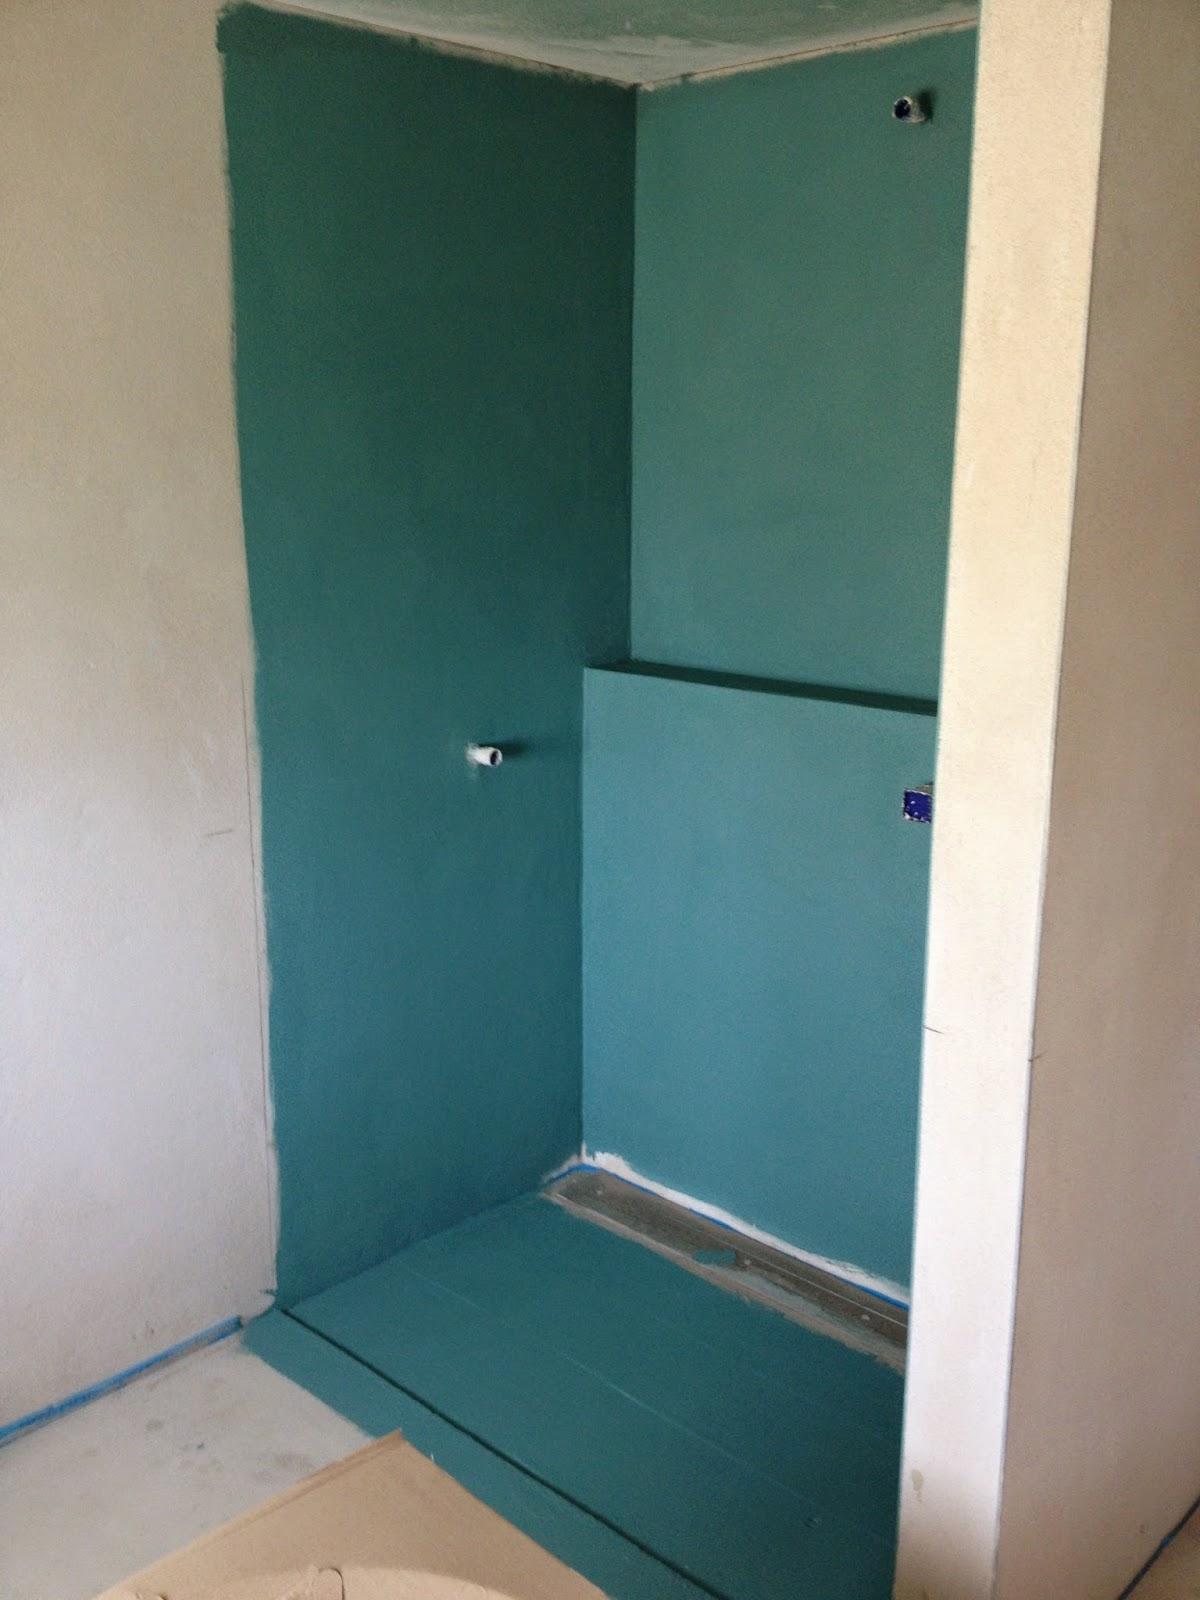 erlenhof 38 auf nach ahrensburg urlaub mal anders innenausbau woche 1. Black Bedroom Furniture Sets. Home Design Ideas